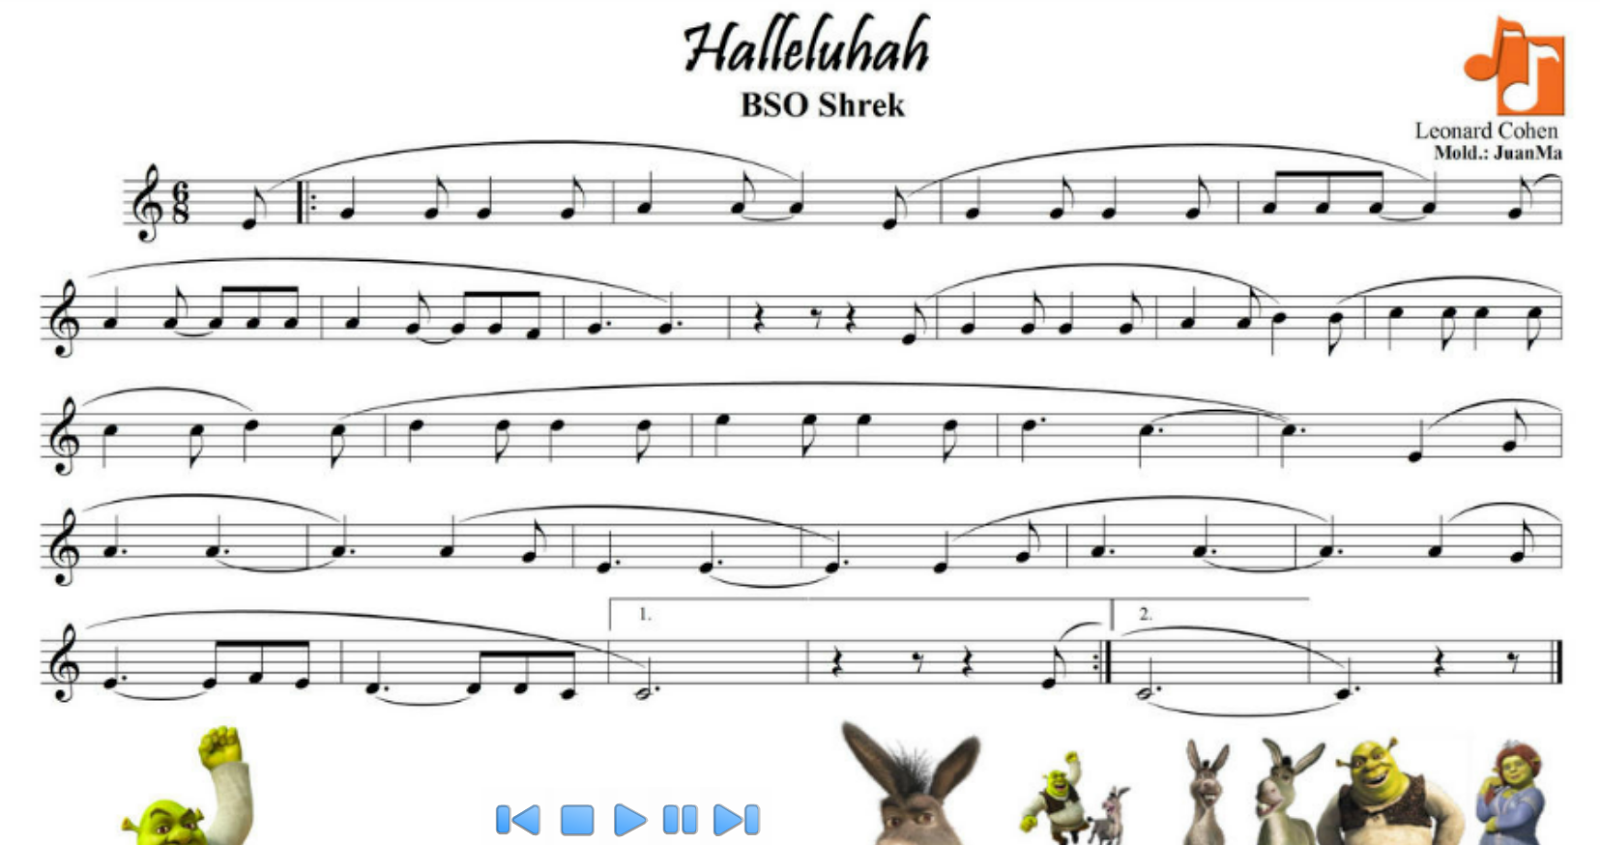 http://ikasmus.wix.com/soundtracks/hallelujah---shrek